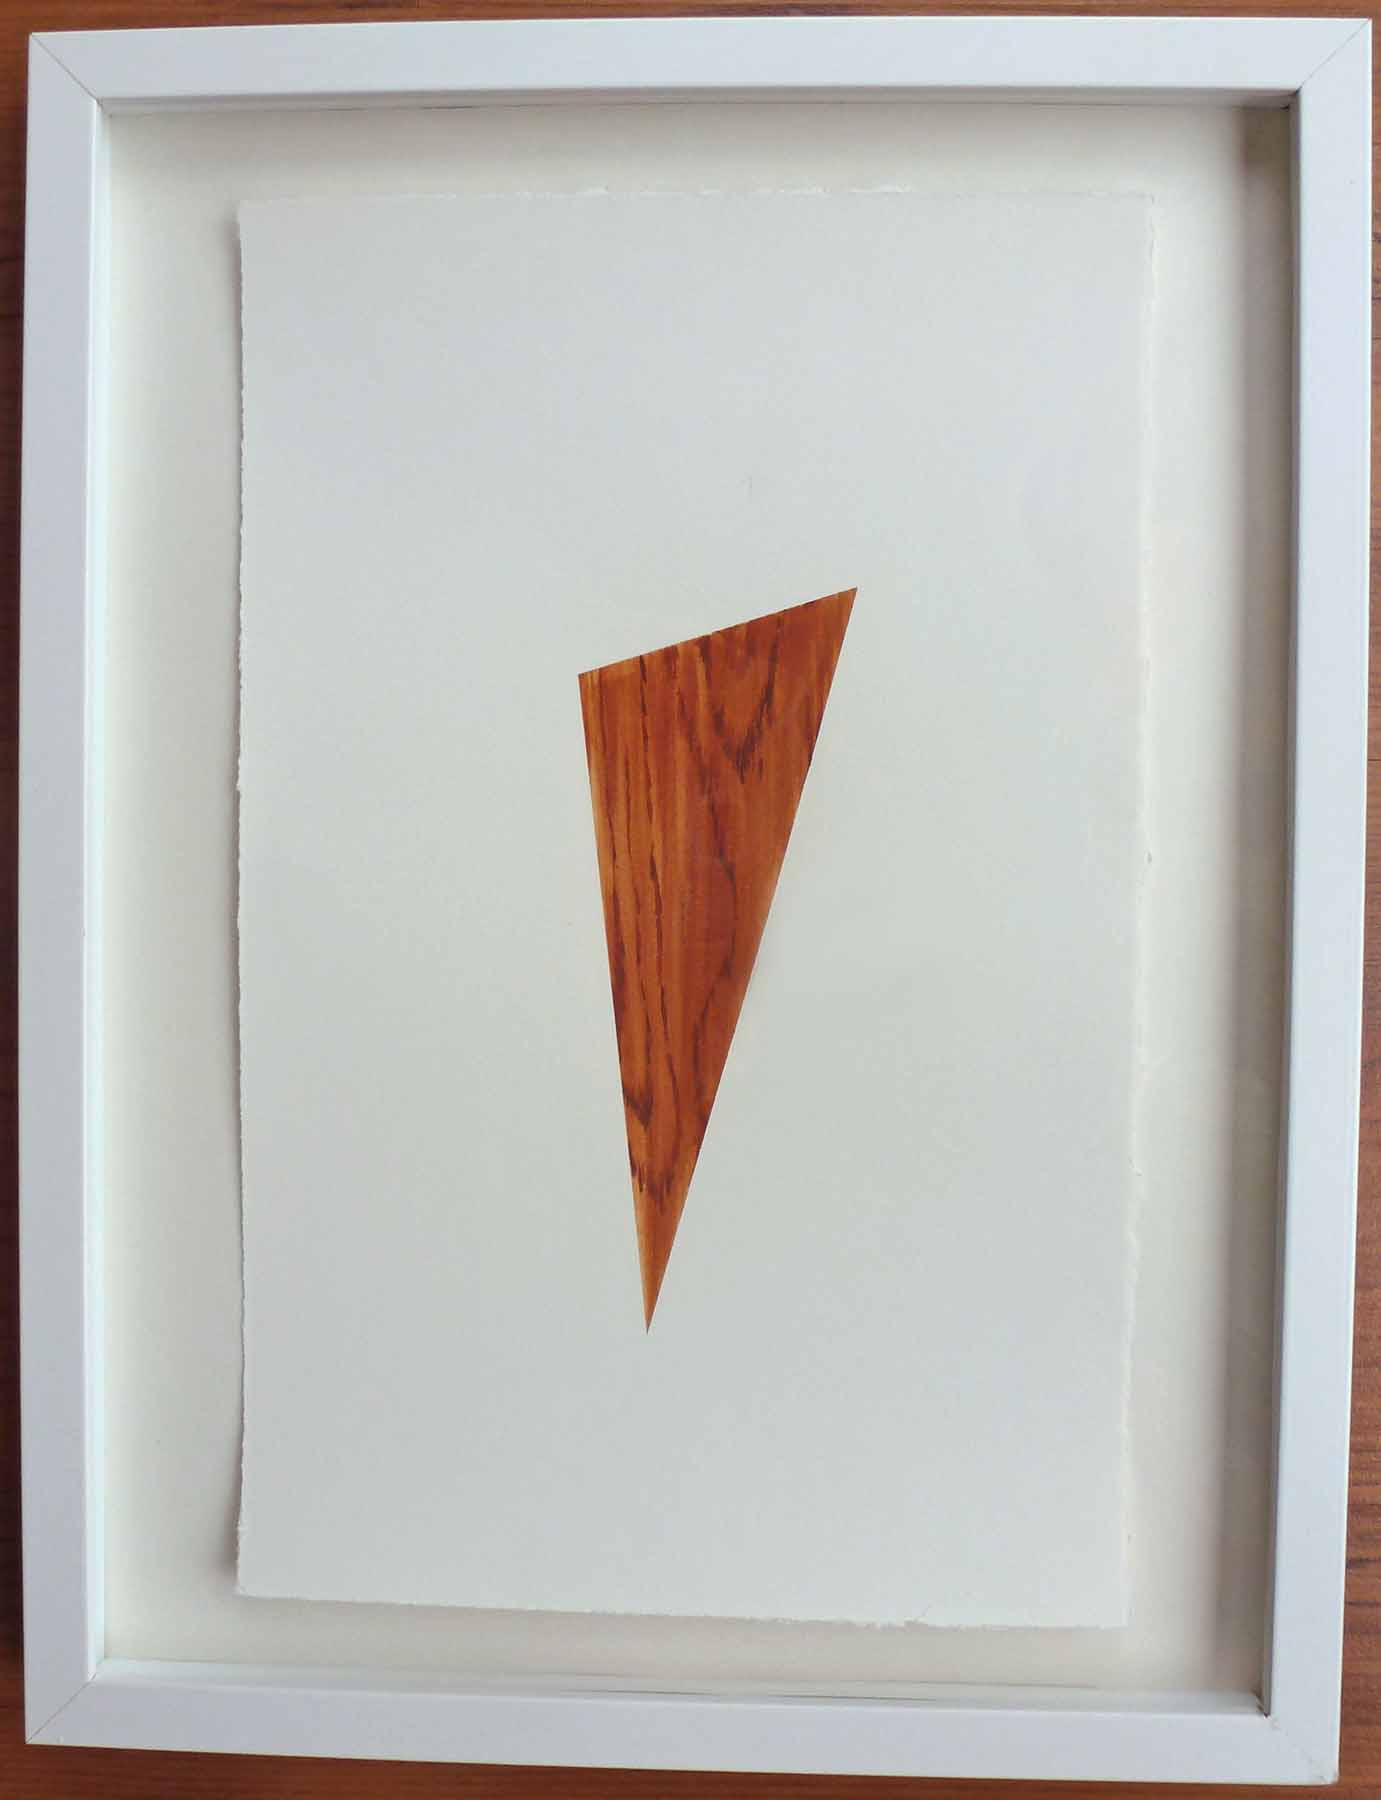 "Teak #3 , 2013, acrylic on paper,12.5"" x 16.5"" (framed)"